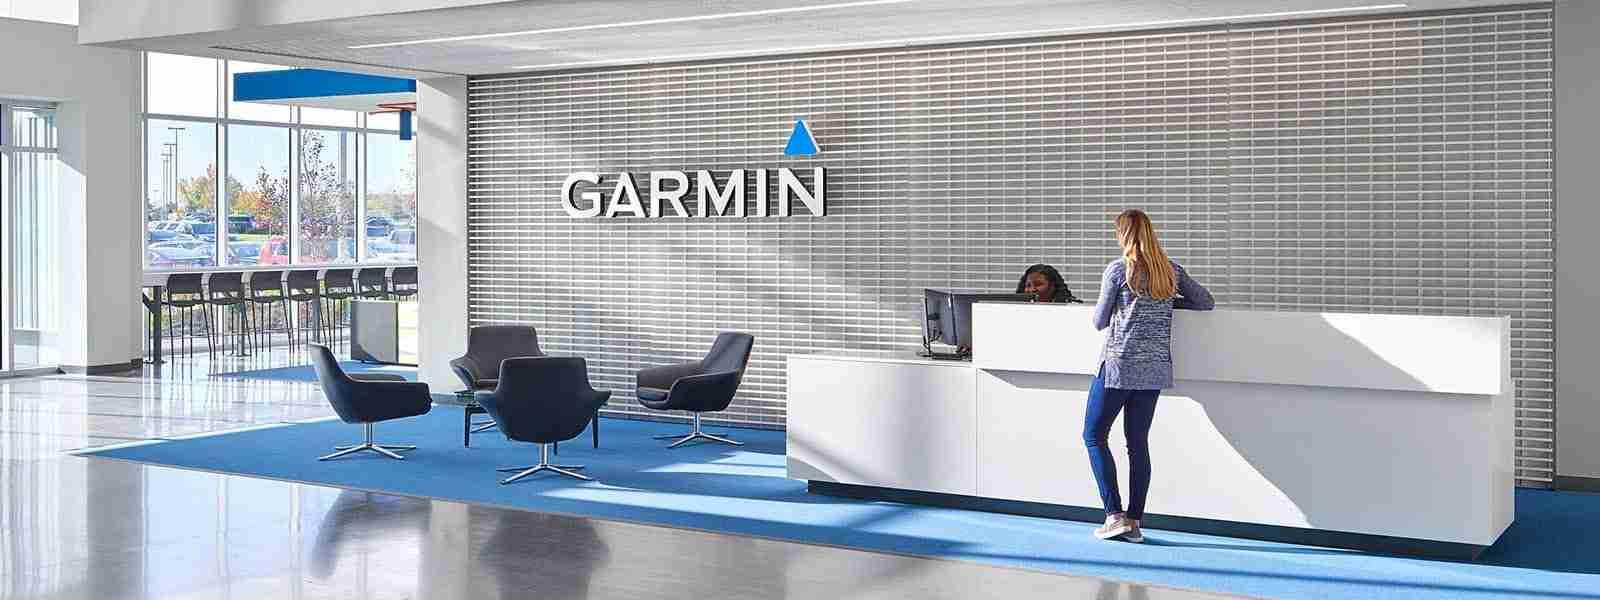 Confirmed: Garmin Received Decryptor For Wastedlocker Ransomware